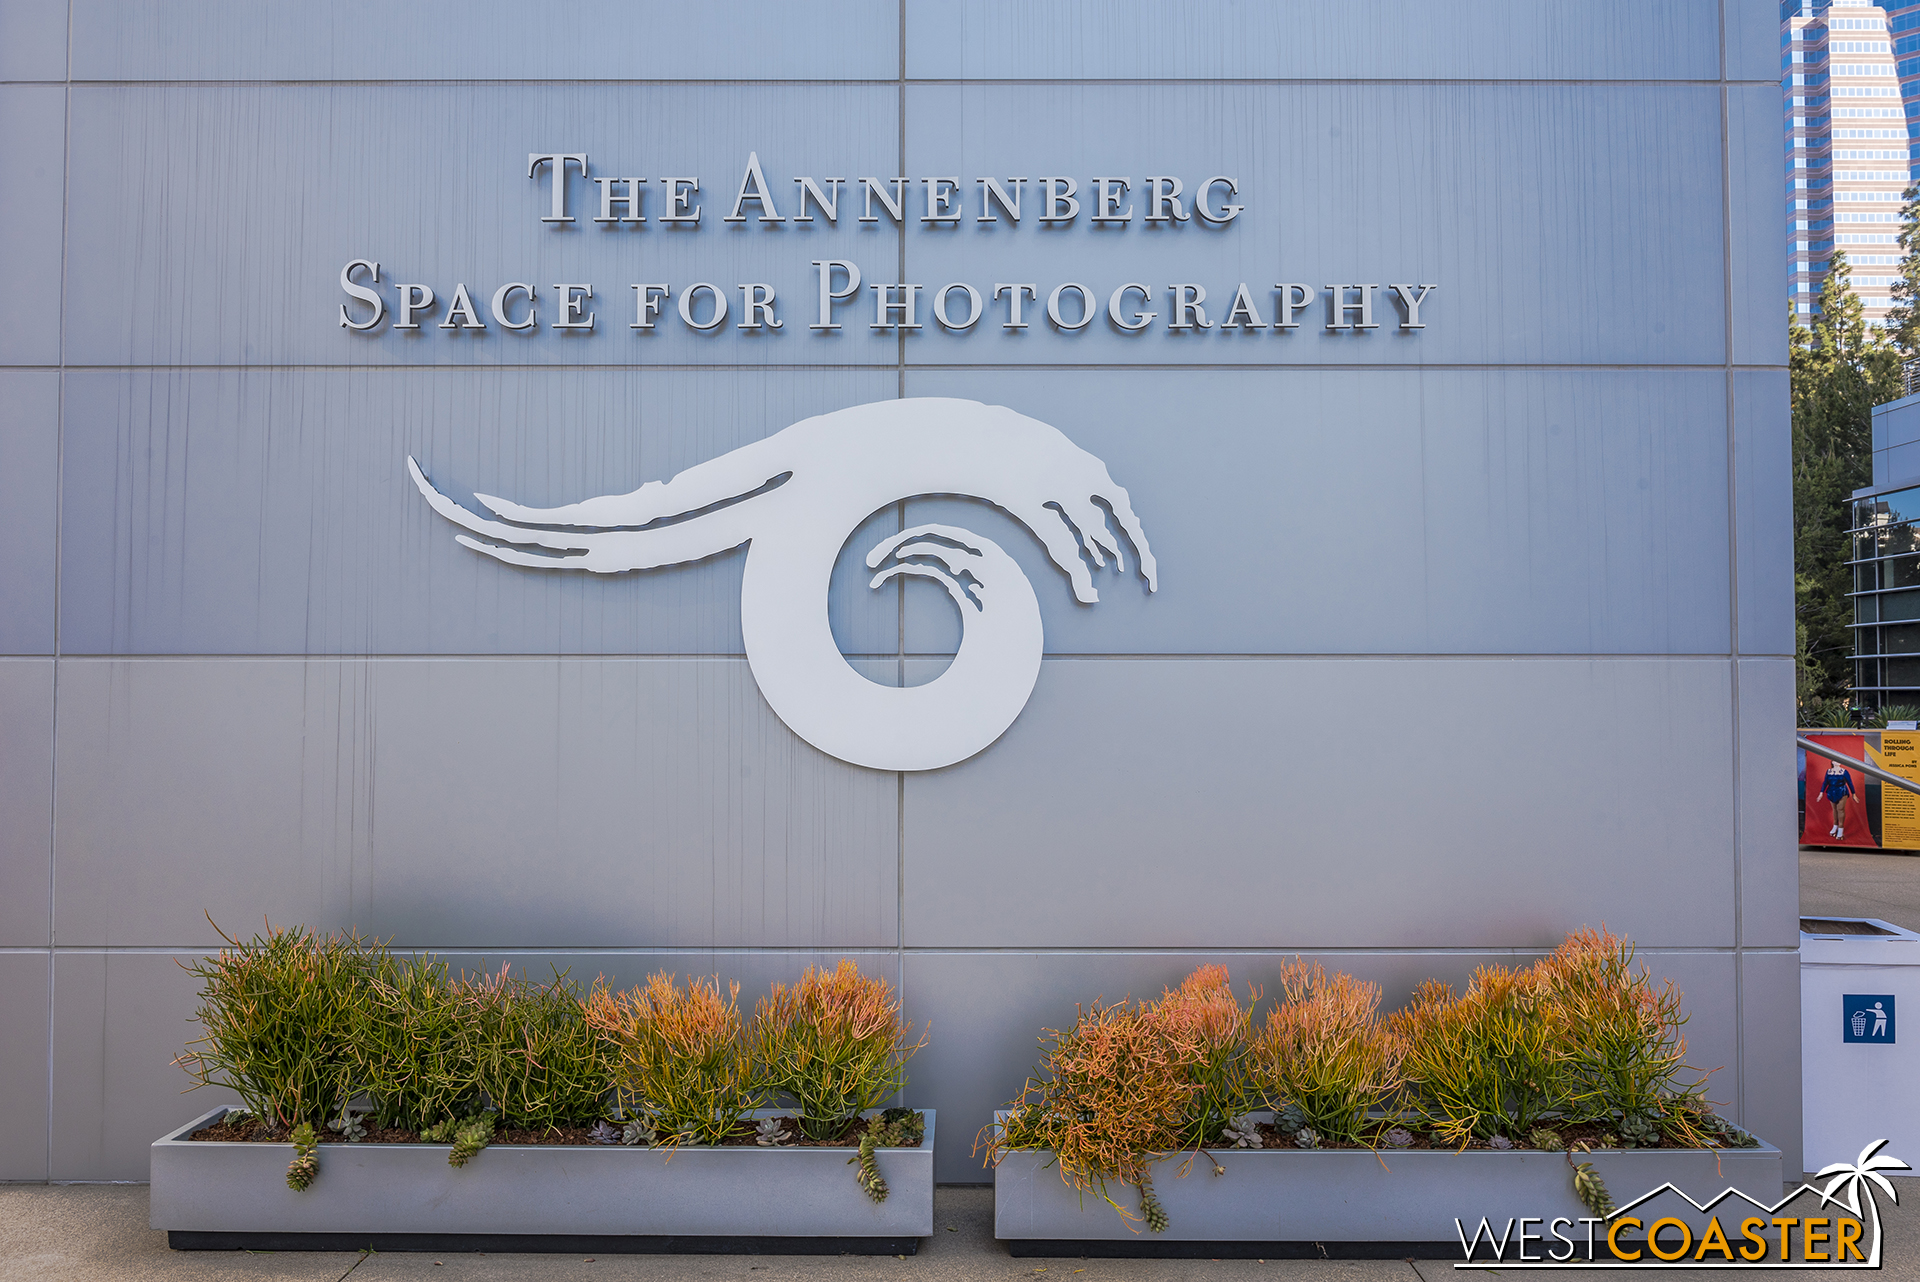 AnnenbergSpaceForPhotography-19_0514-0015.jpg